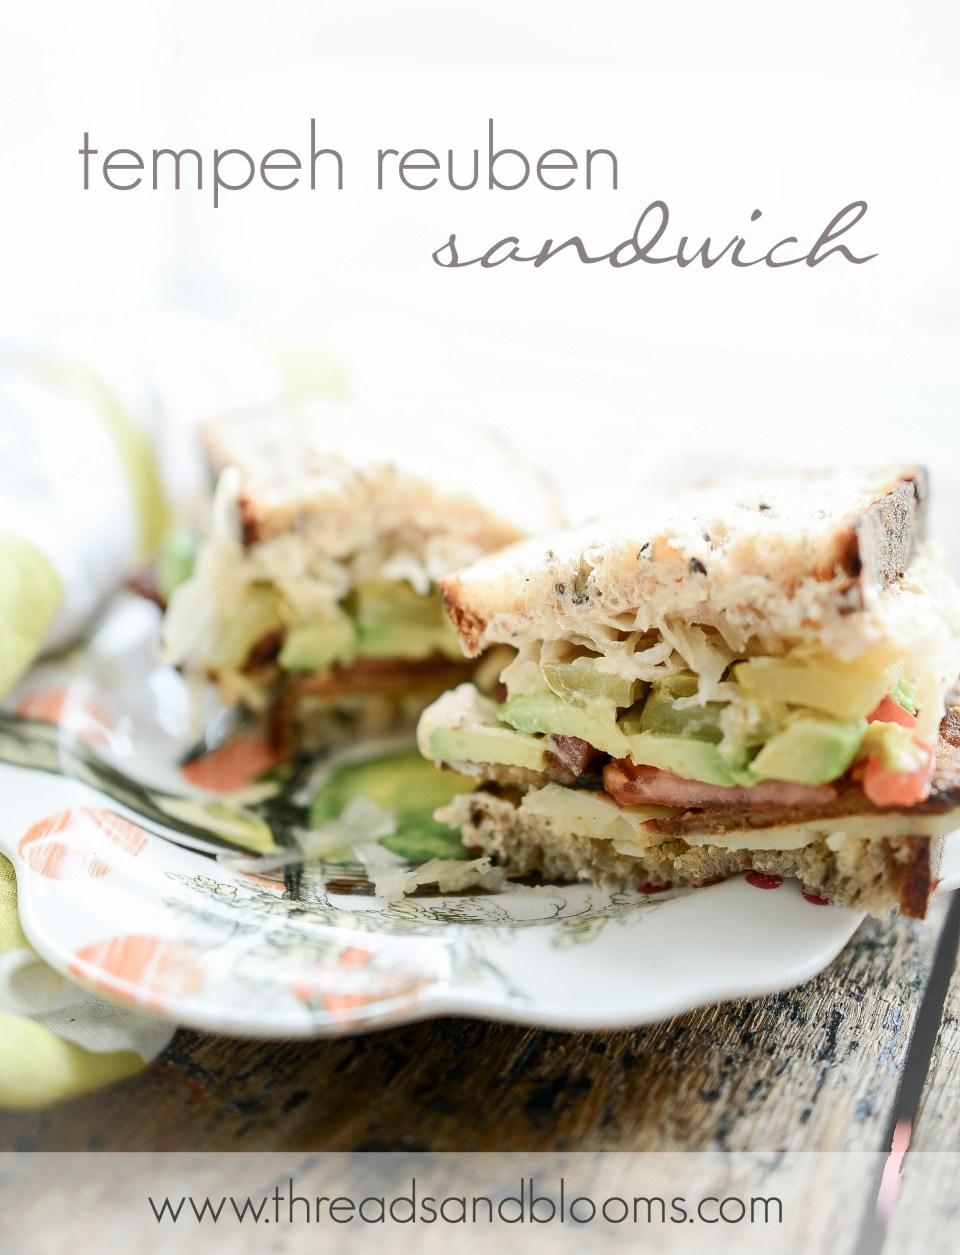 Vegetarian Sandwich Recipe - Tempeh Reuben Sandwich